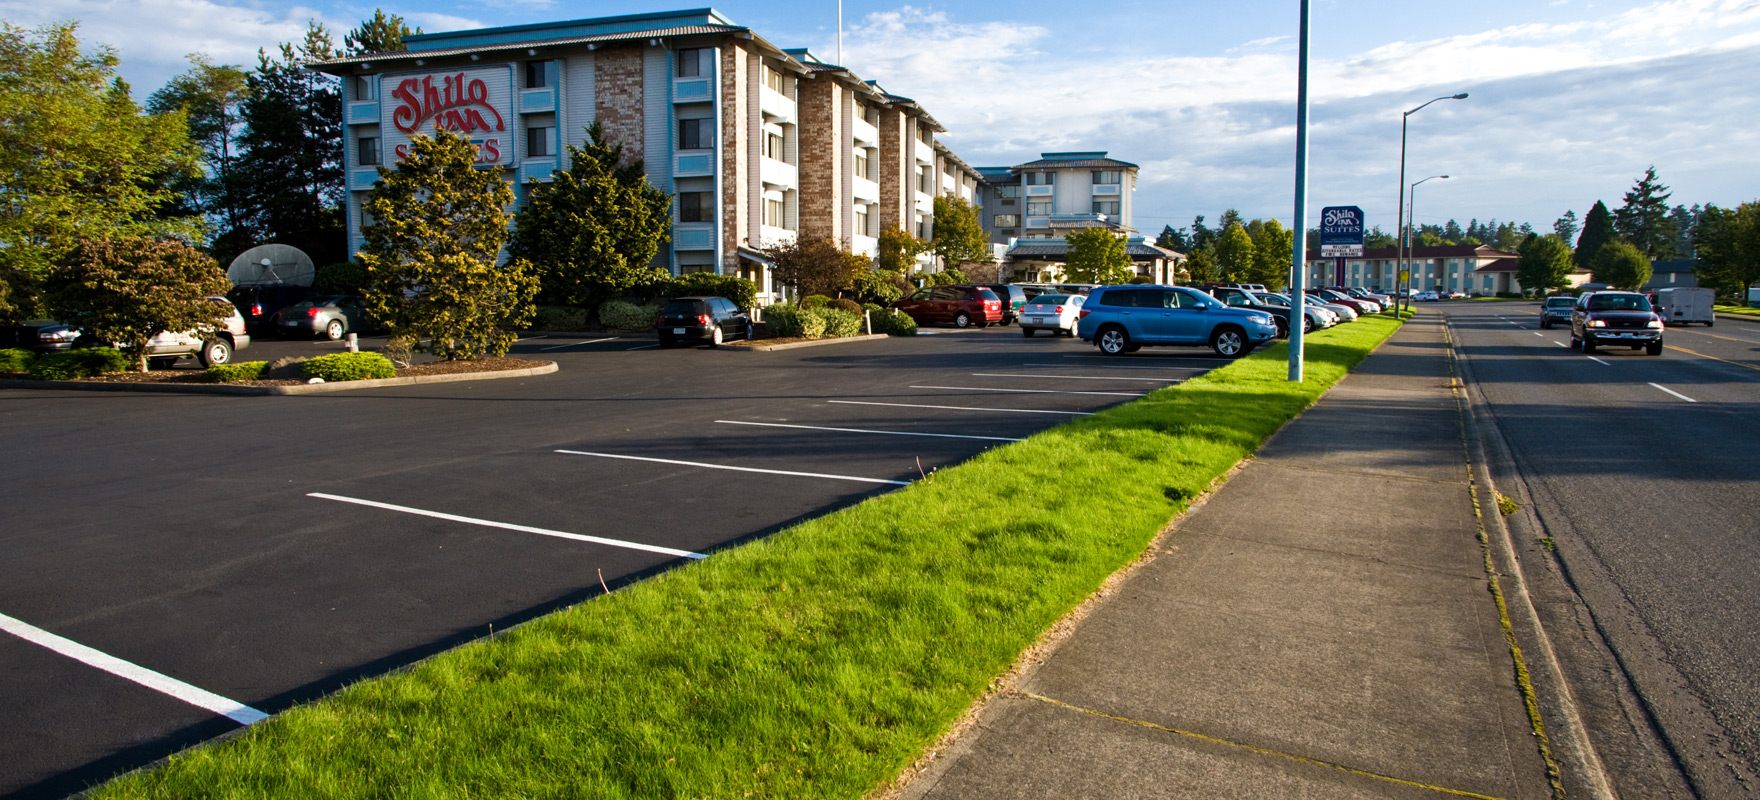 Shilo Inns Suites Hotels Tacoma Washington